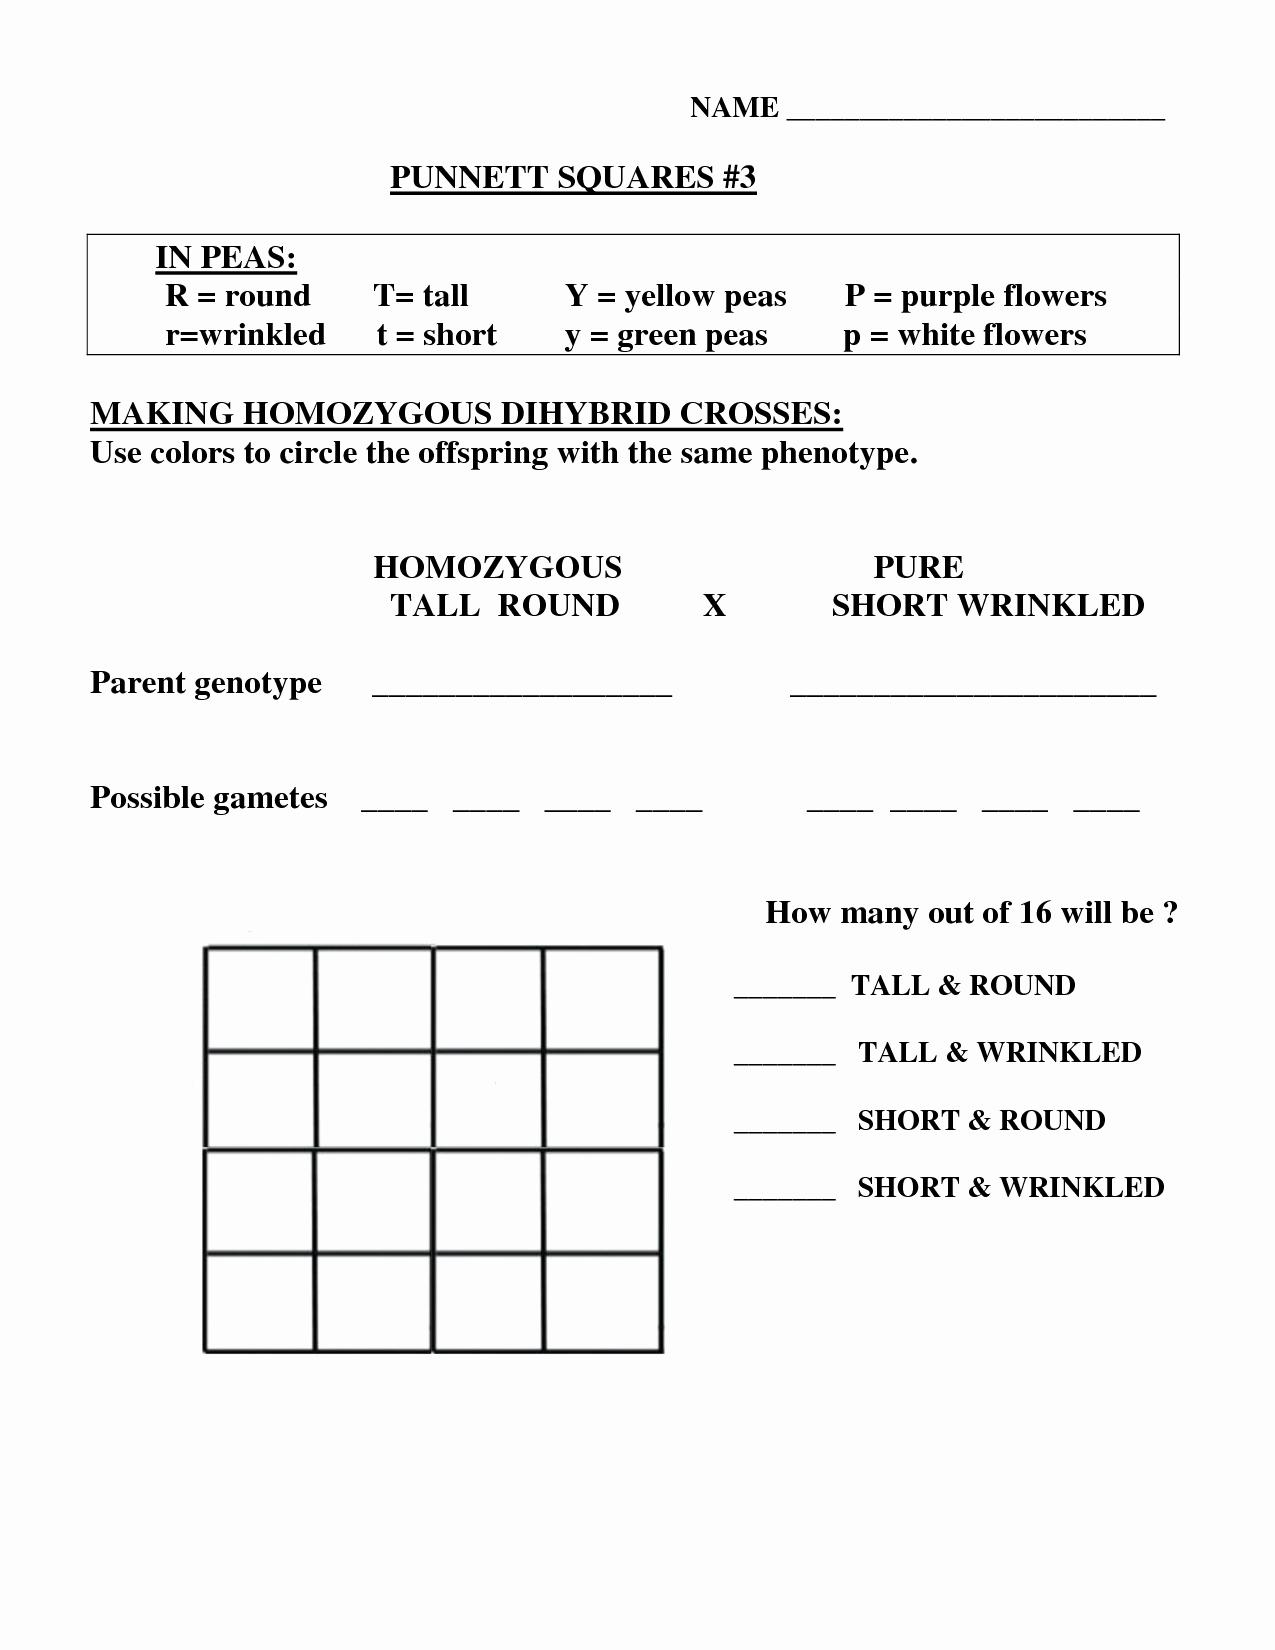 50 Dihybrid Cross Worksheet Answers